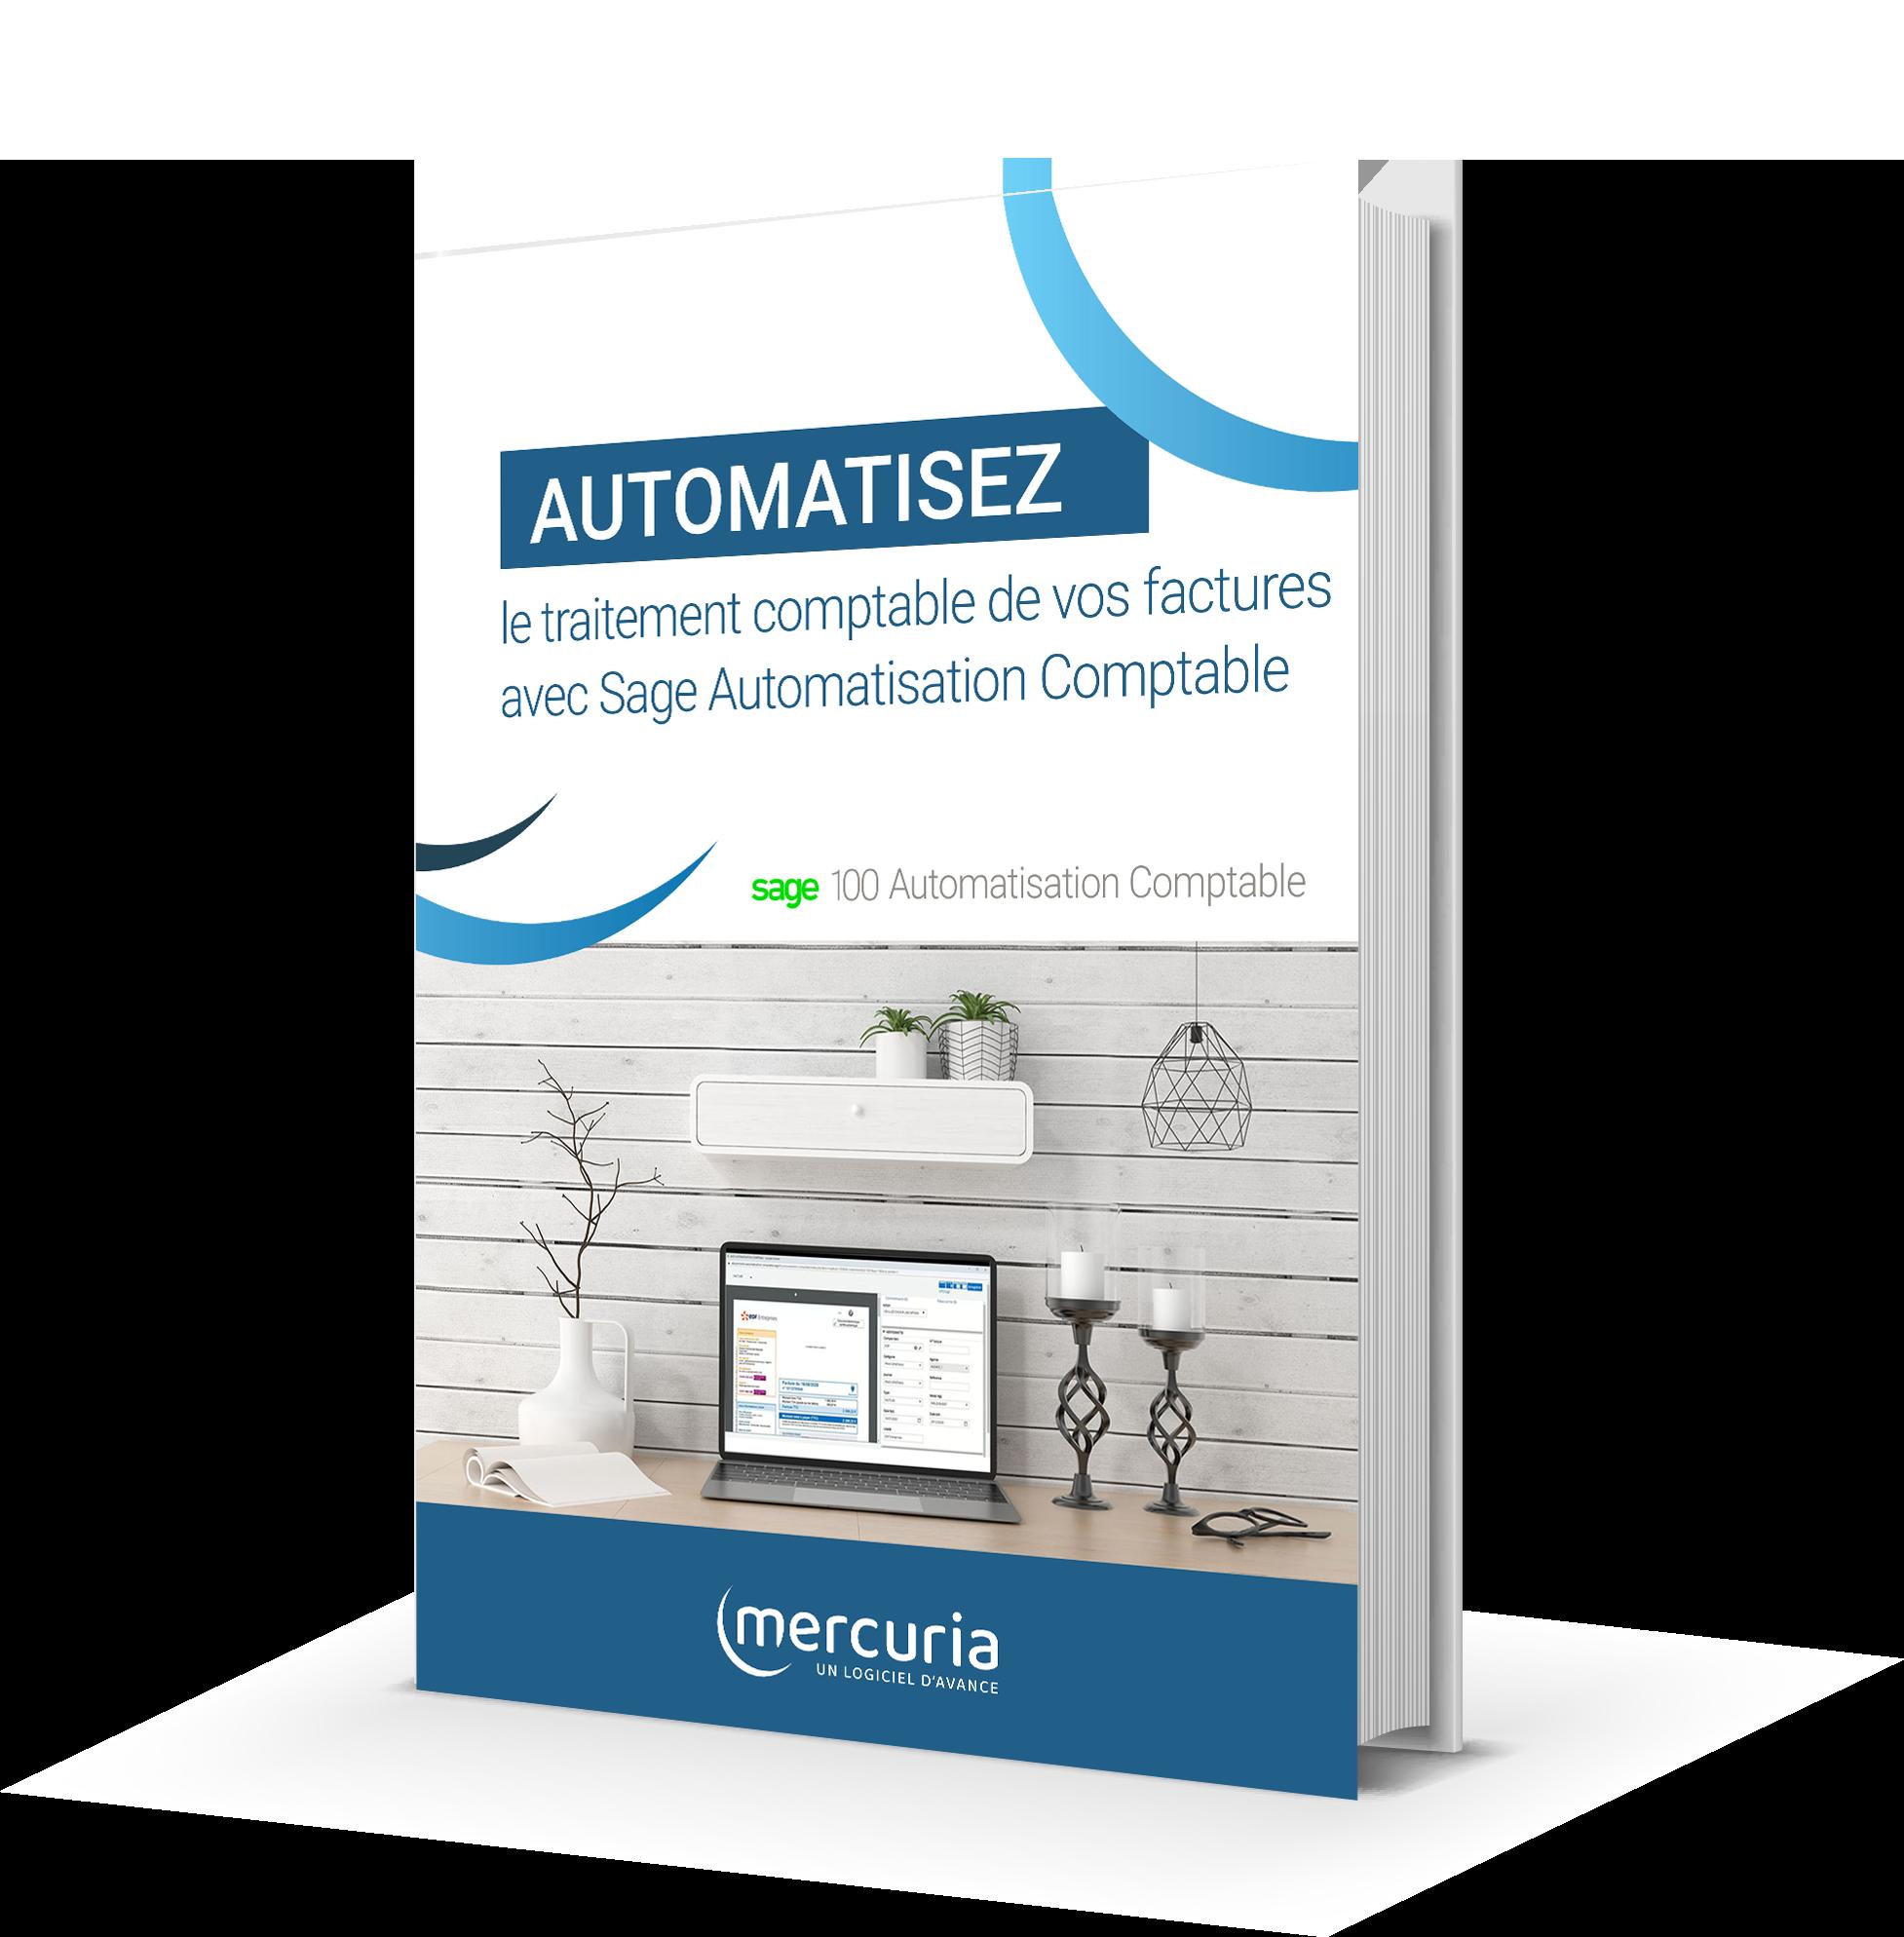 Plaquette Mercuria_sage 100 Automatisation Comptable